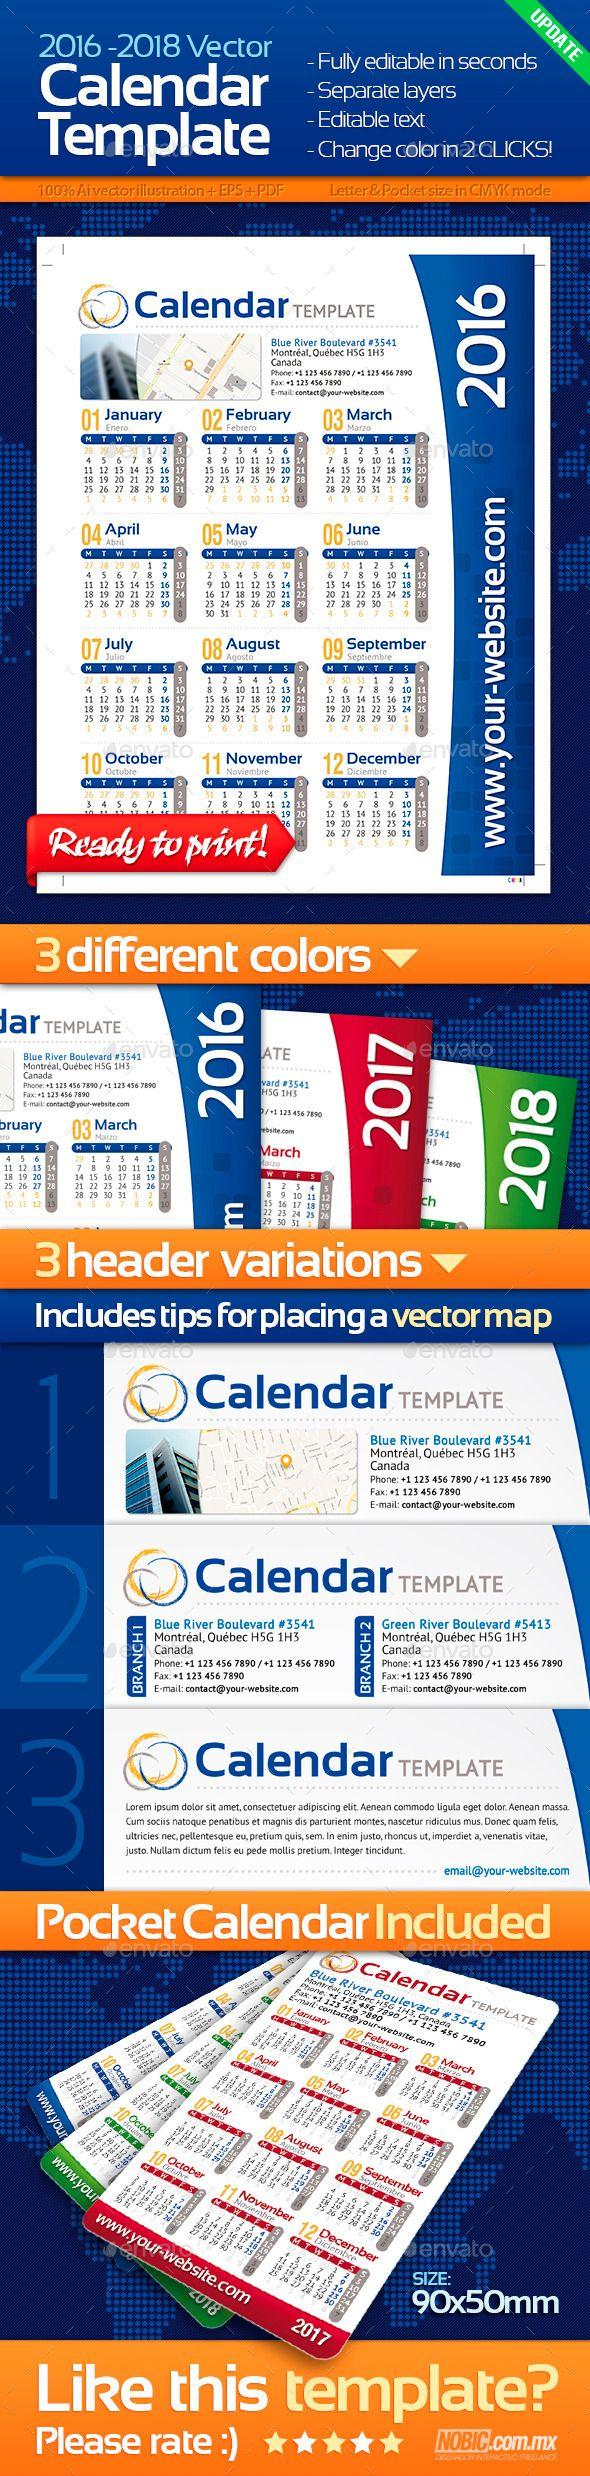 The 77 best calendar template 2018 images on pinterest calendar 2016 2017 and 2018 calendar template friedricerecipe Images